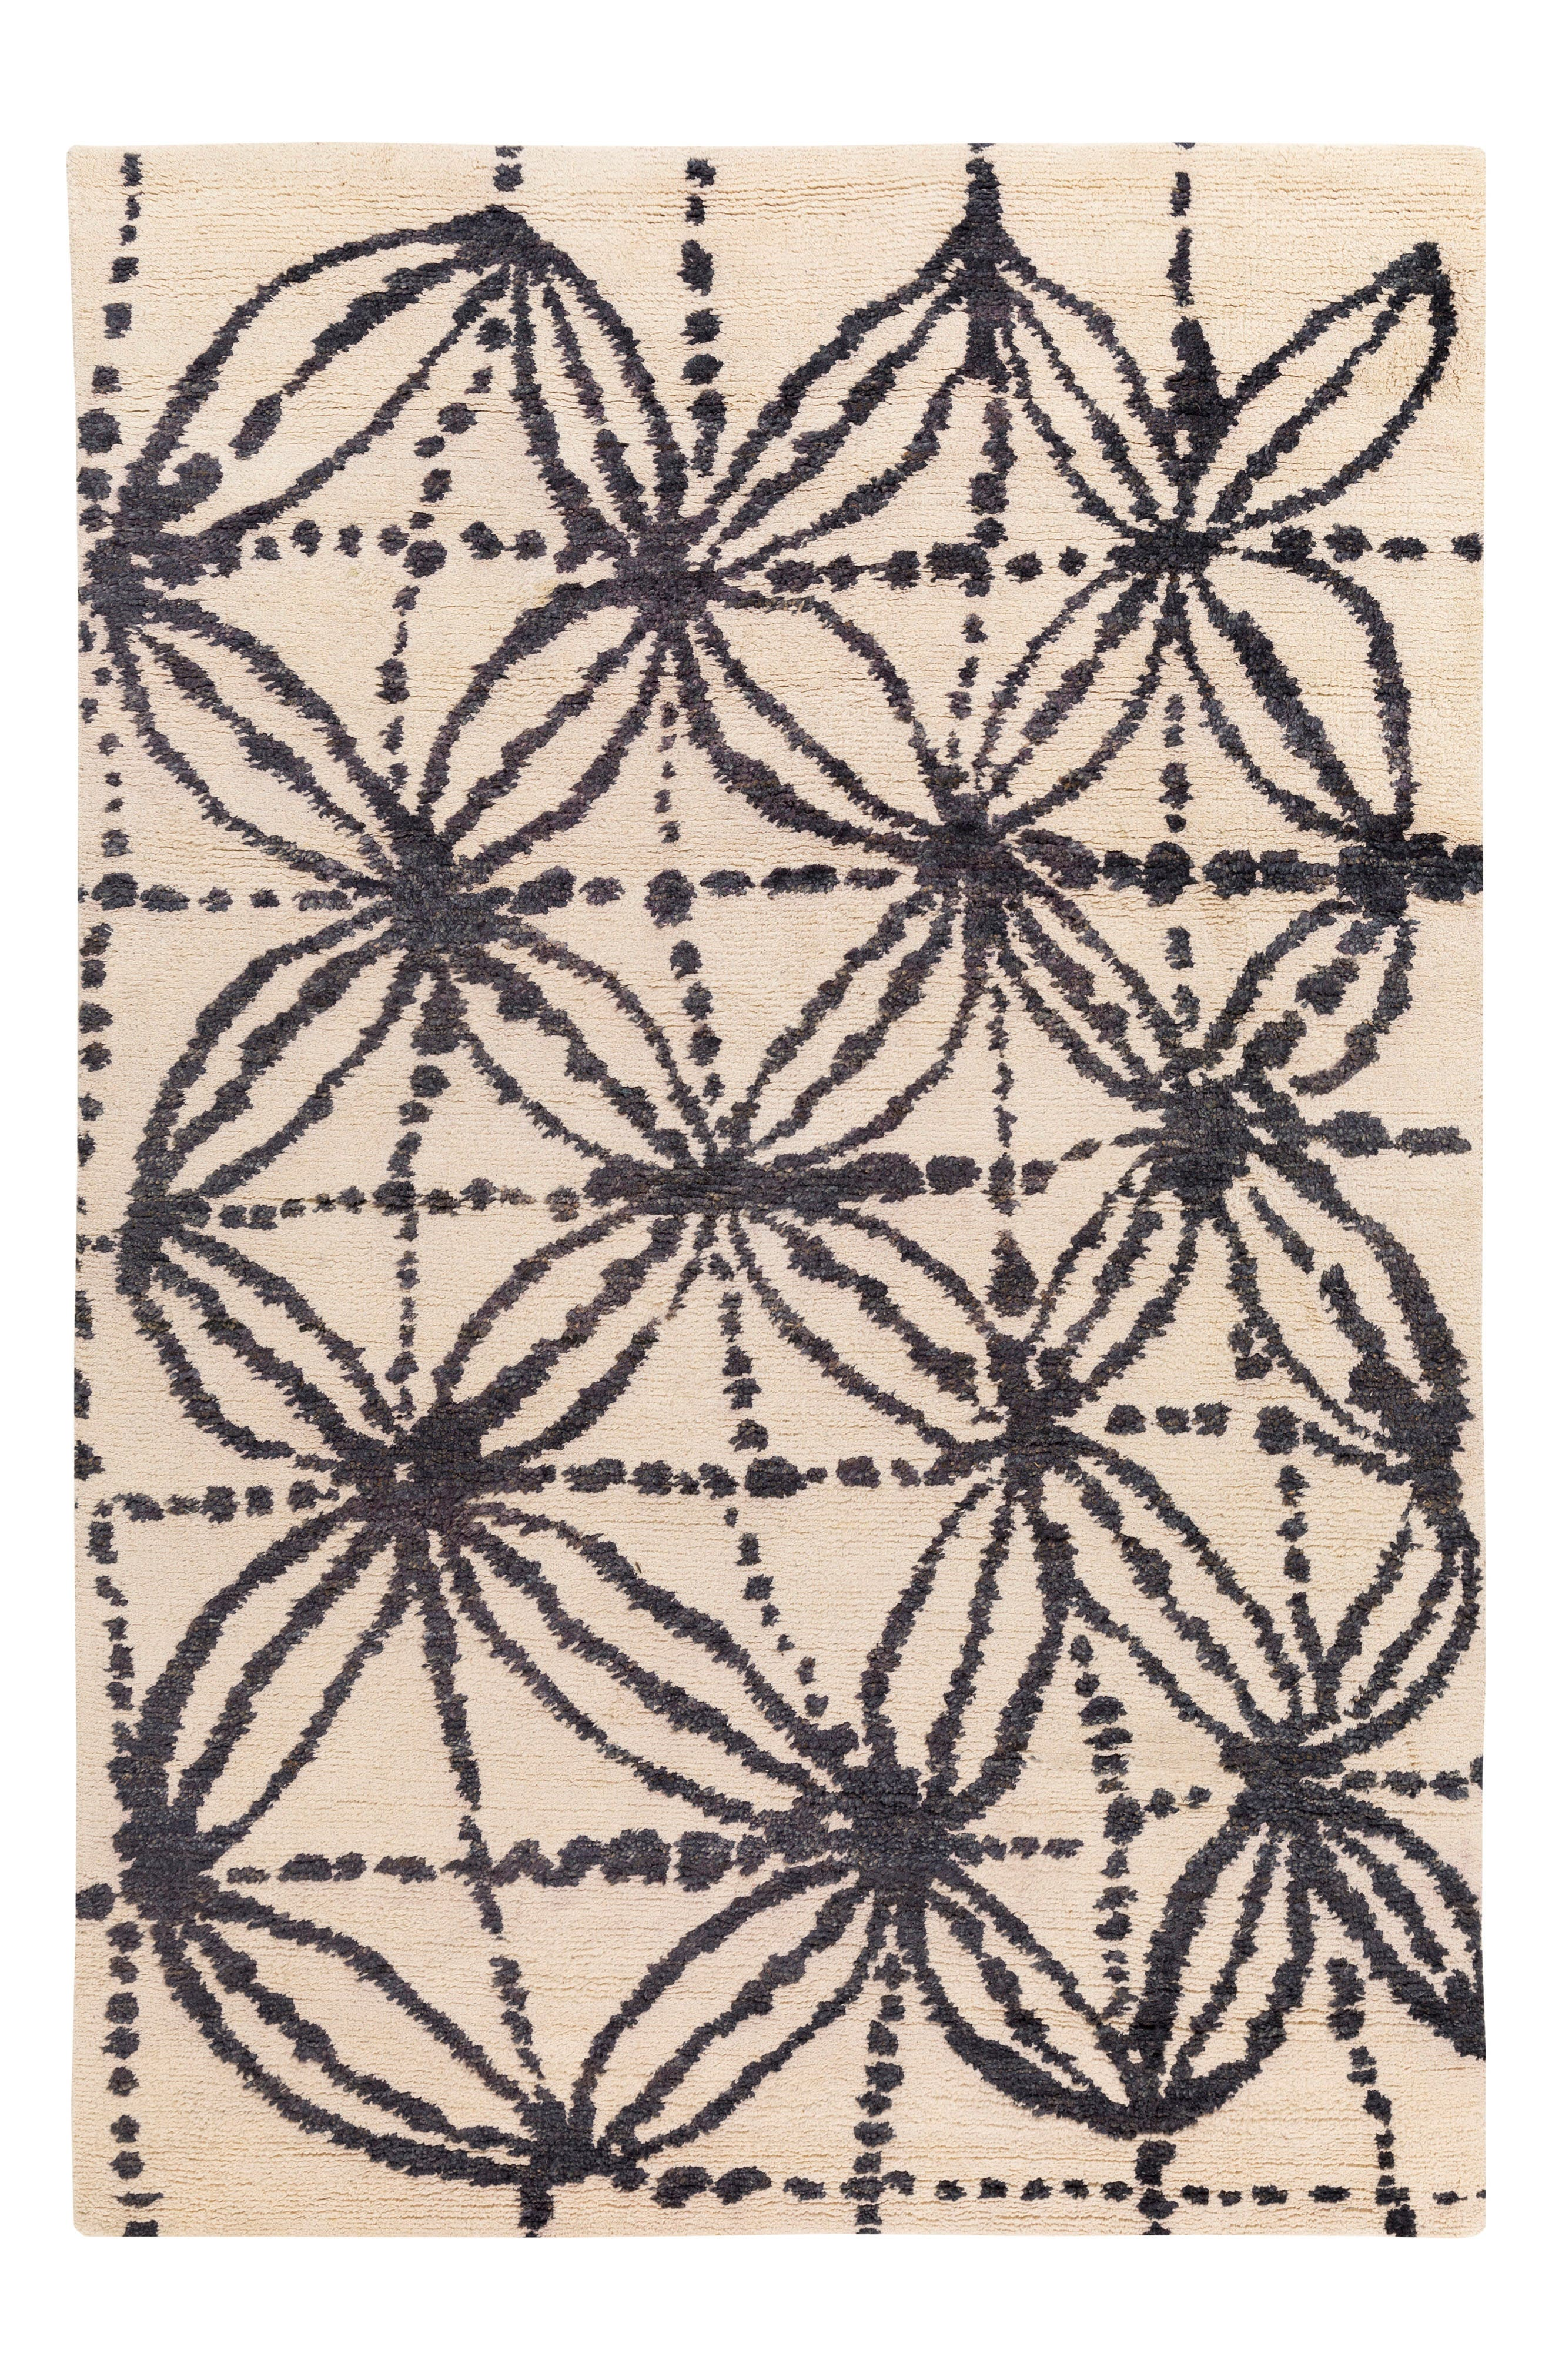 Orinocco Area Rug,                             Main thumbnail 1, color,                             001